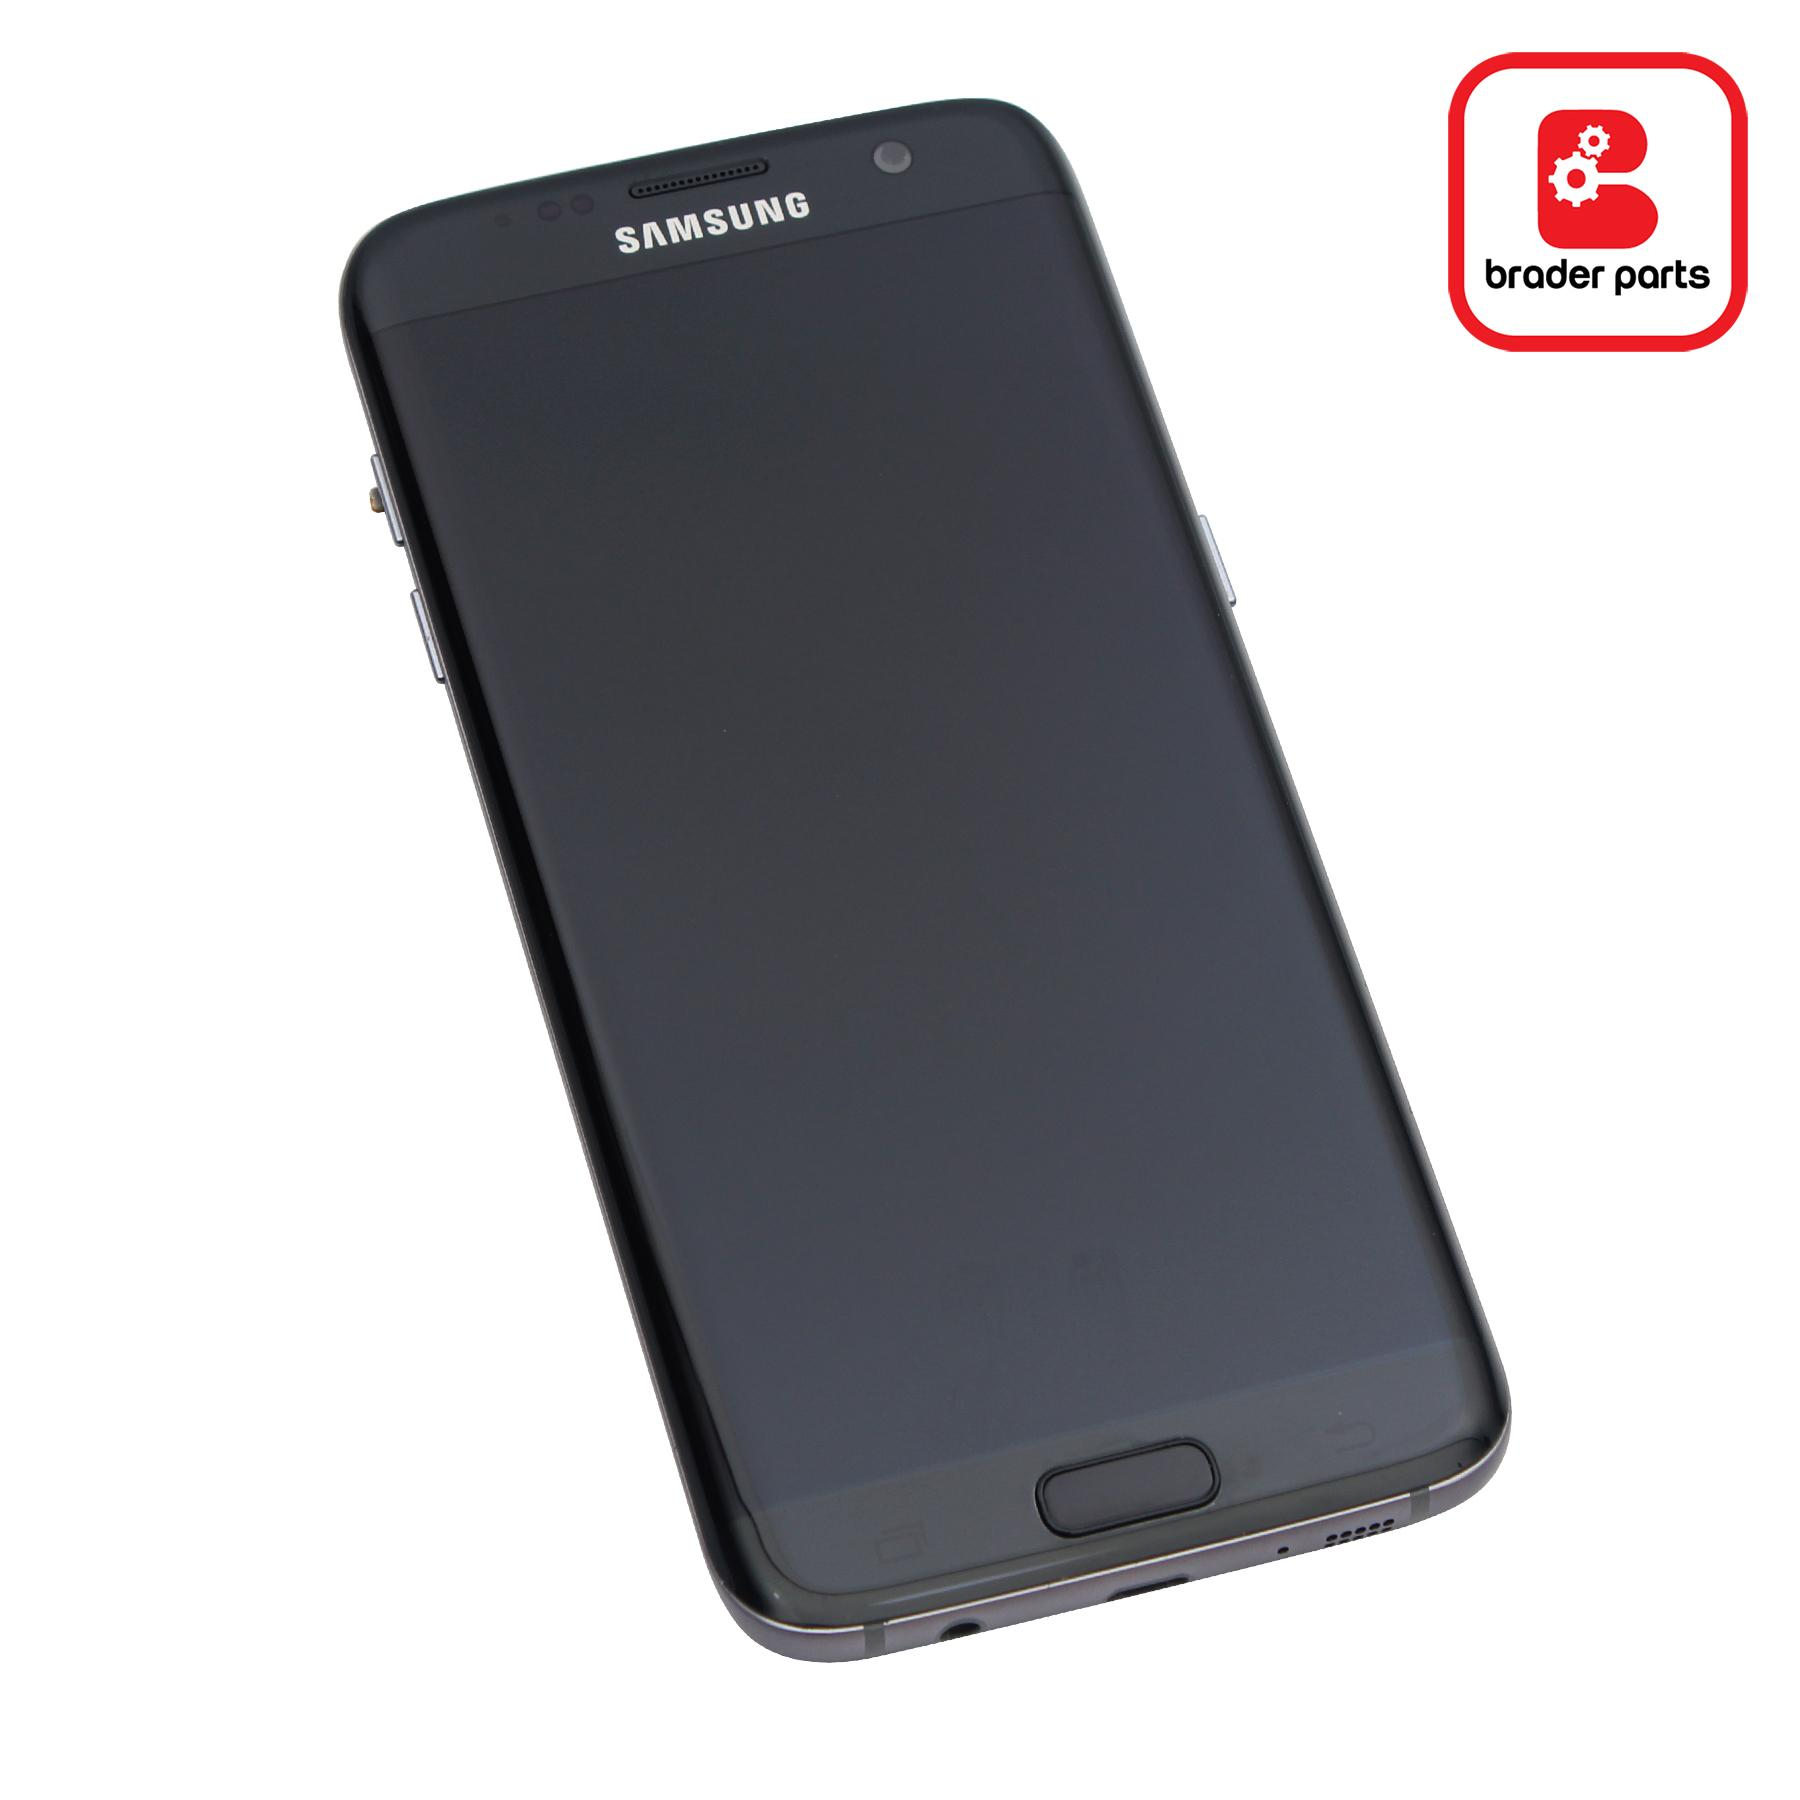 LCD TOUCHSCREEN SAMSUNG S7 EDGE BLACK